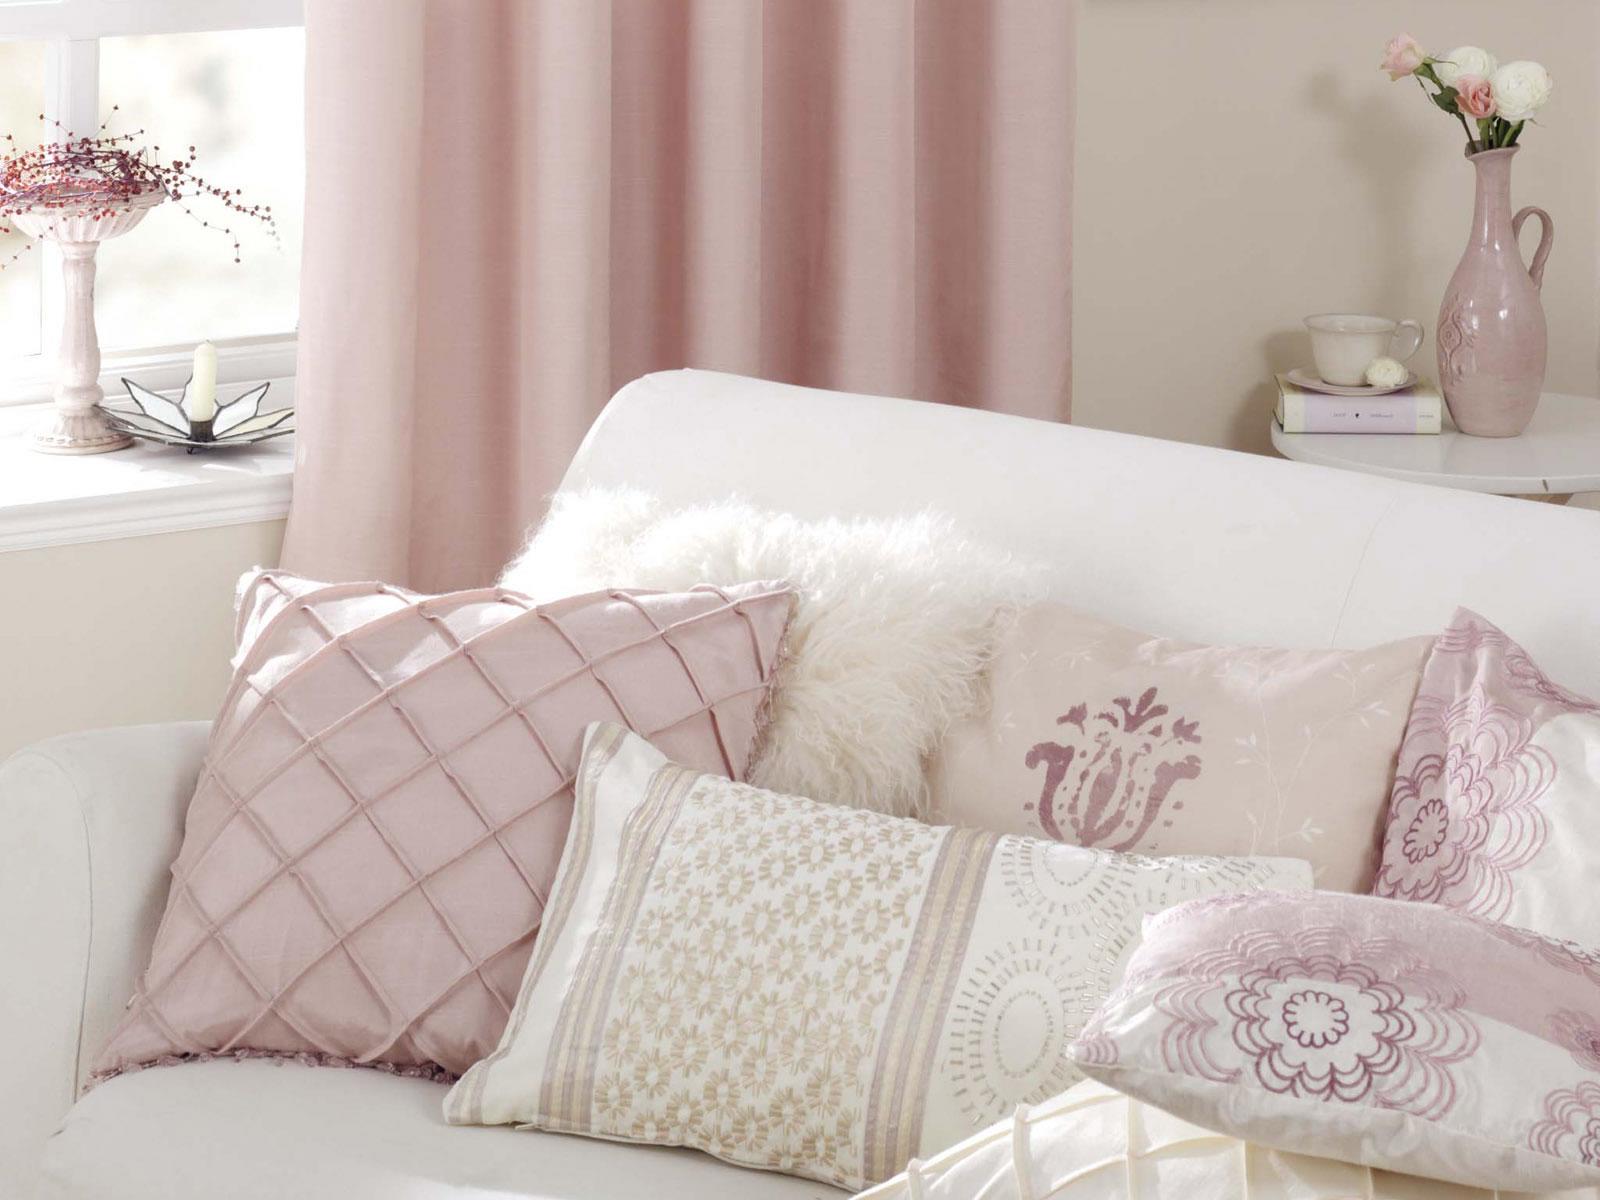 almofadas para sofa 5 #4F572C 1600x1200